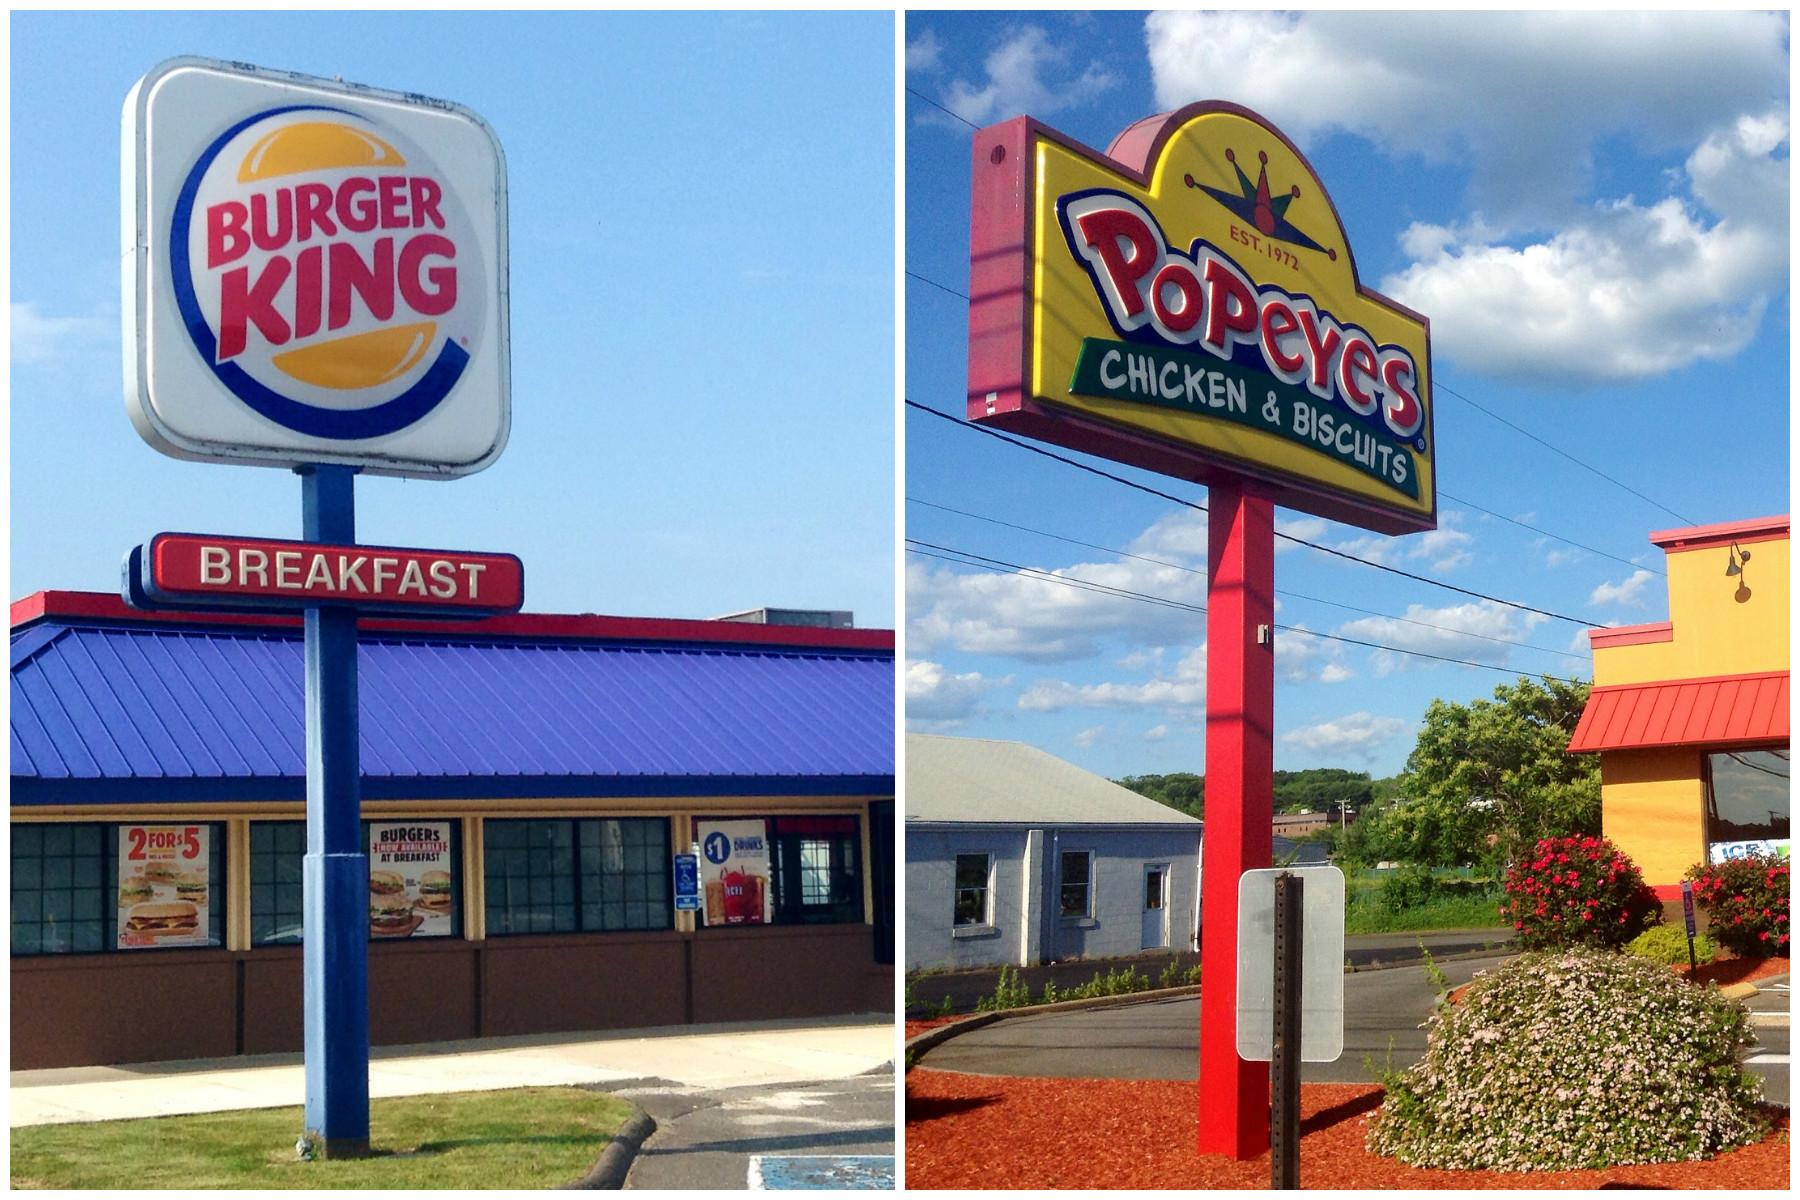 Burger King Buys Popeyes for $1.8 Billion in Fast-Food Mega-Merger